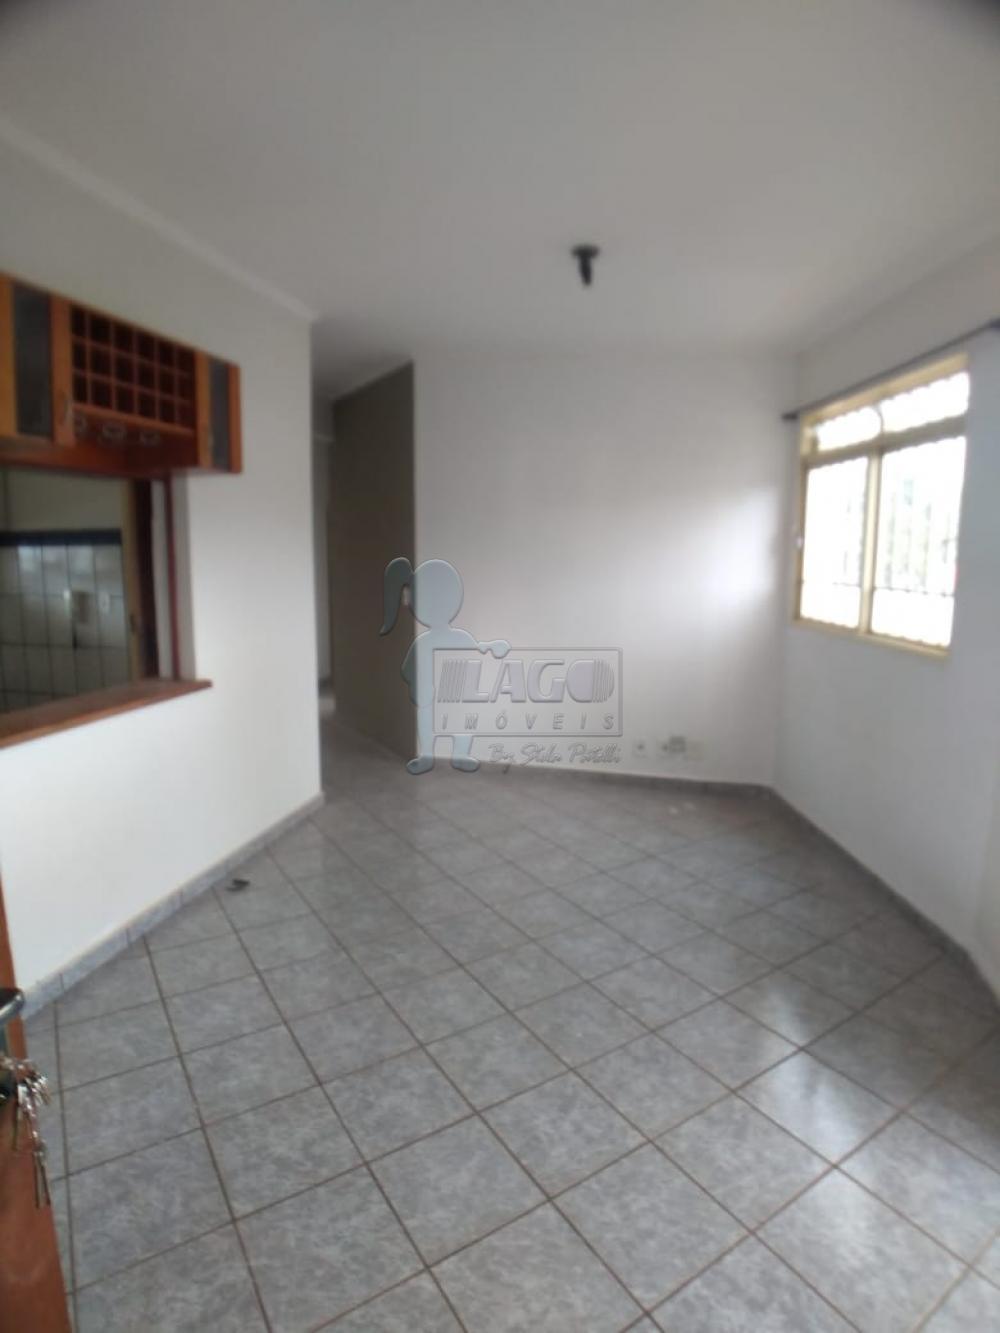 Ribeirao Preto Apartamento Locacao R$ 1.000,00 Condominio R$180,00 3 Dormitorios 1 Suite Area do terreno 58.33m2 Area construida 80.38m2